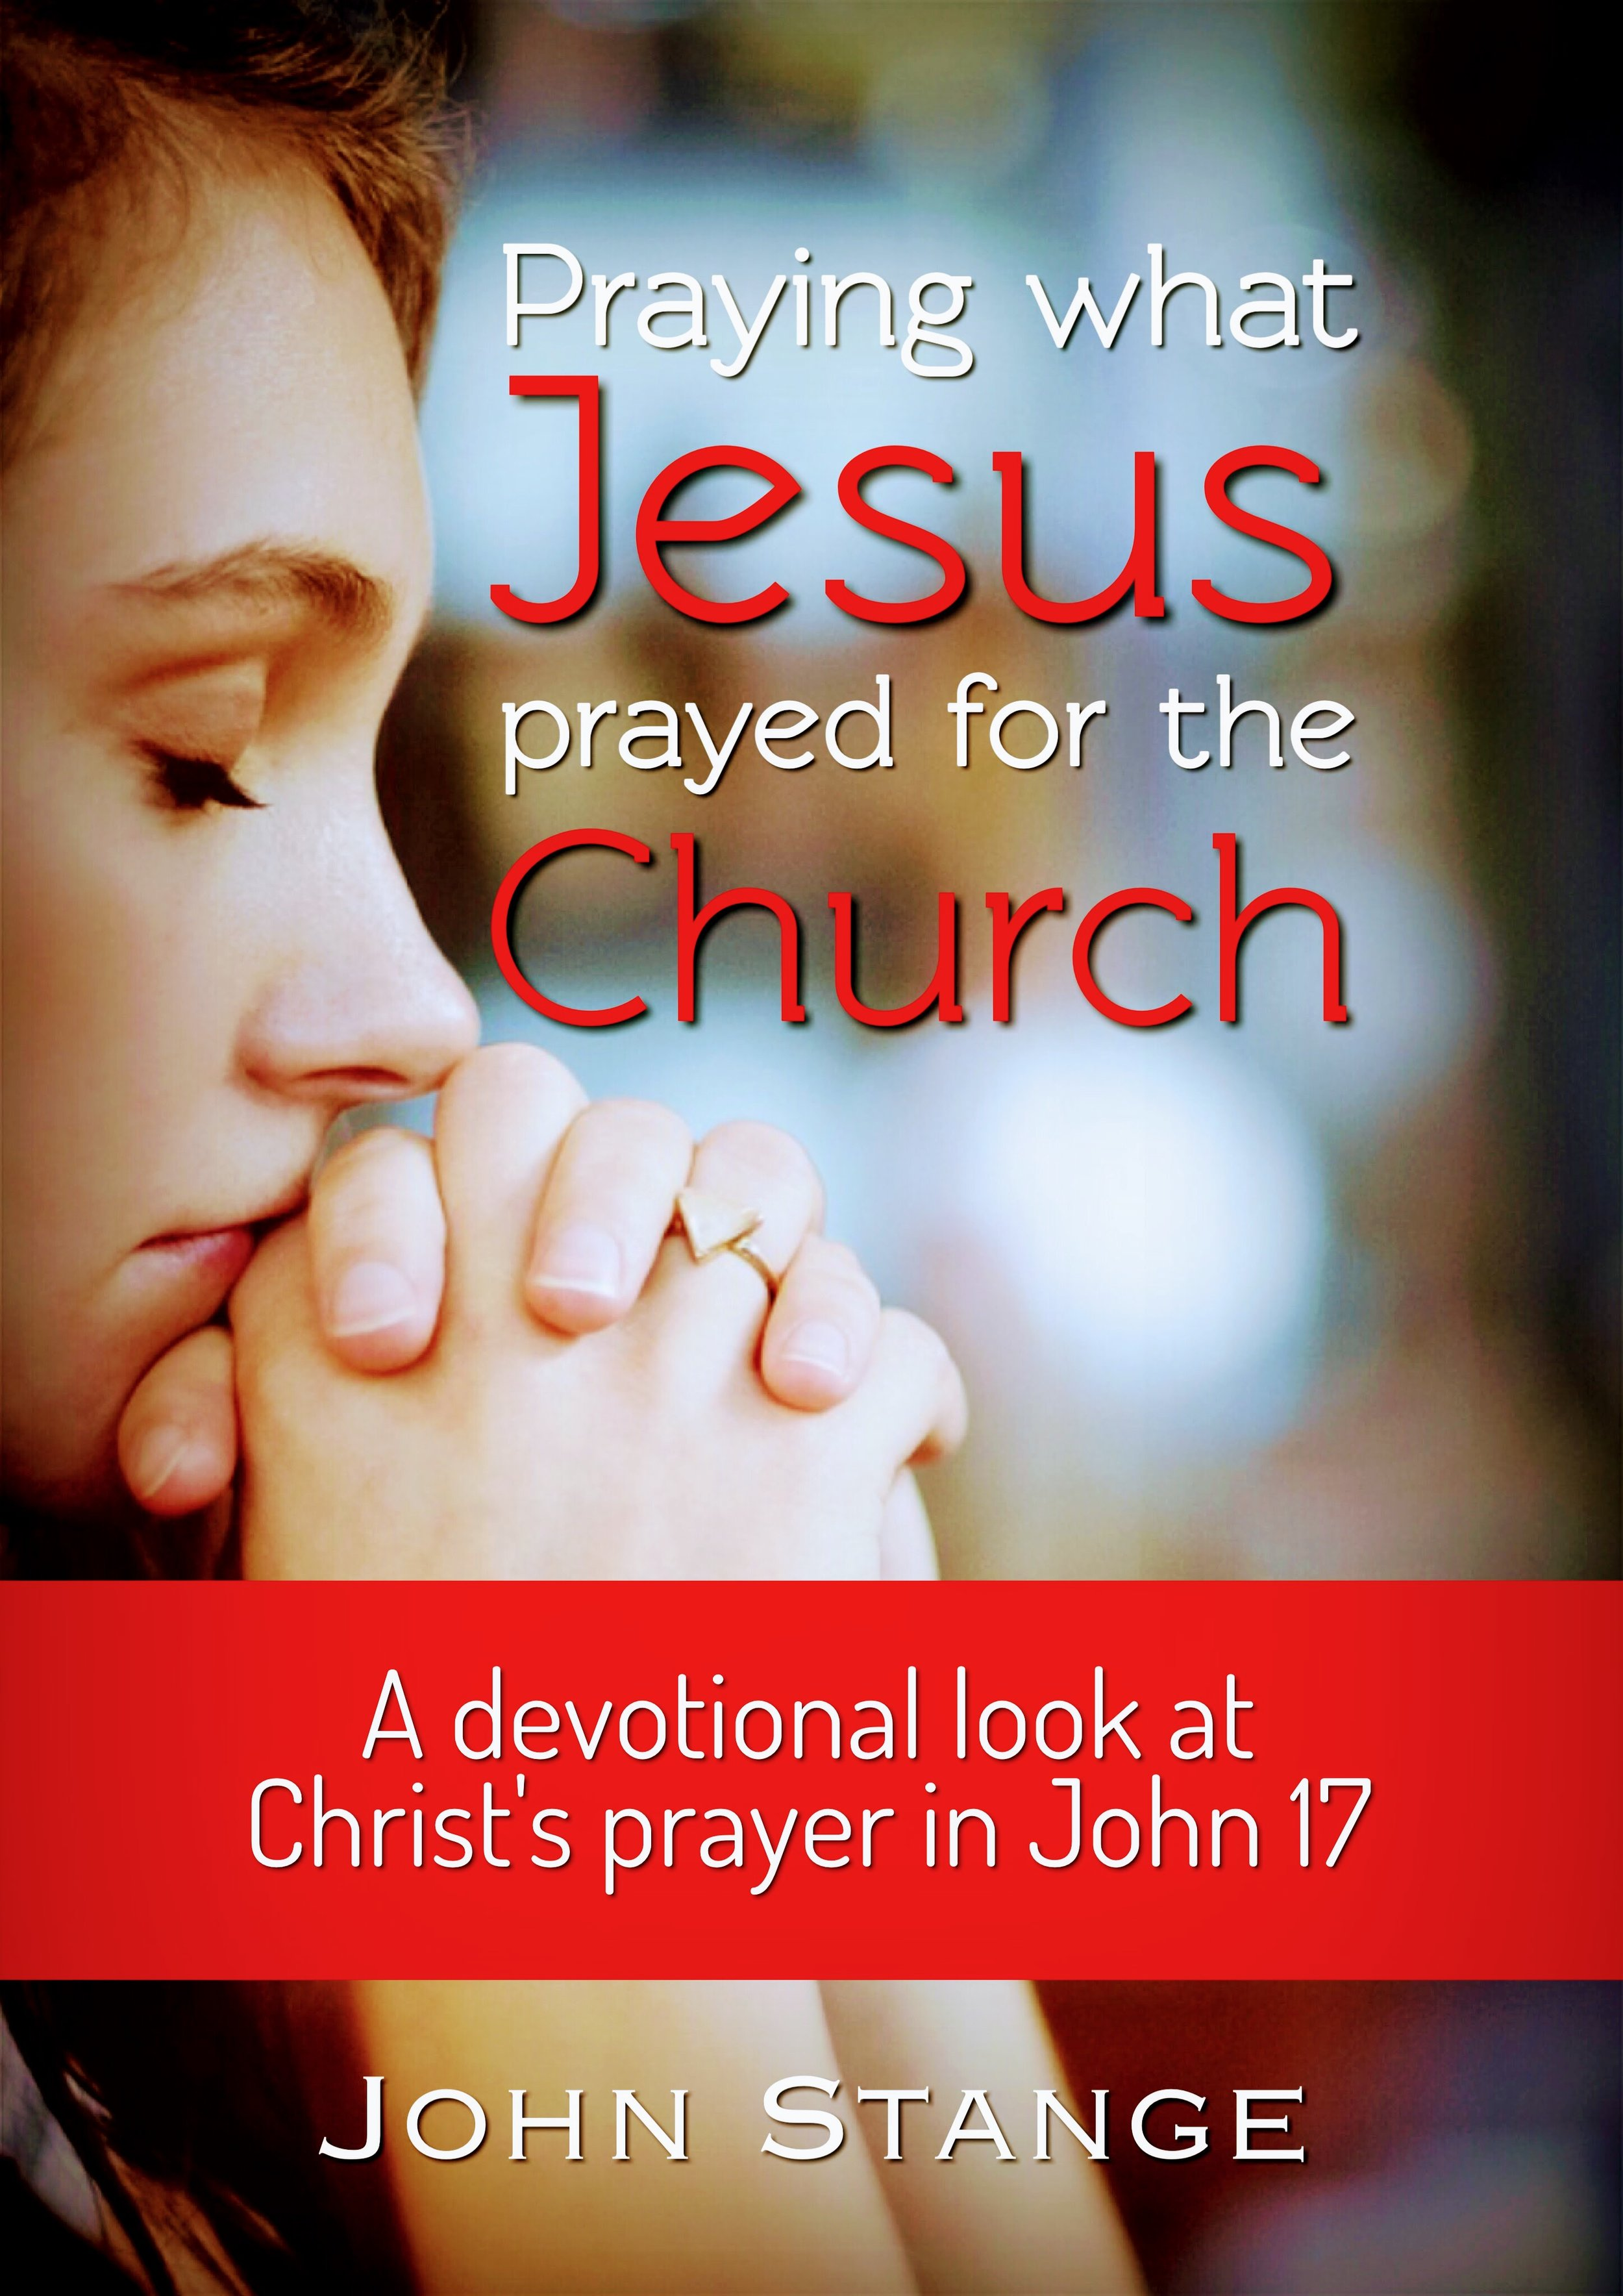 Praying what Jesus Prayed for the Church.JPG